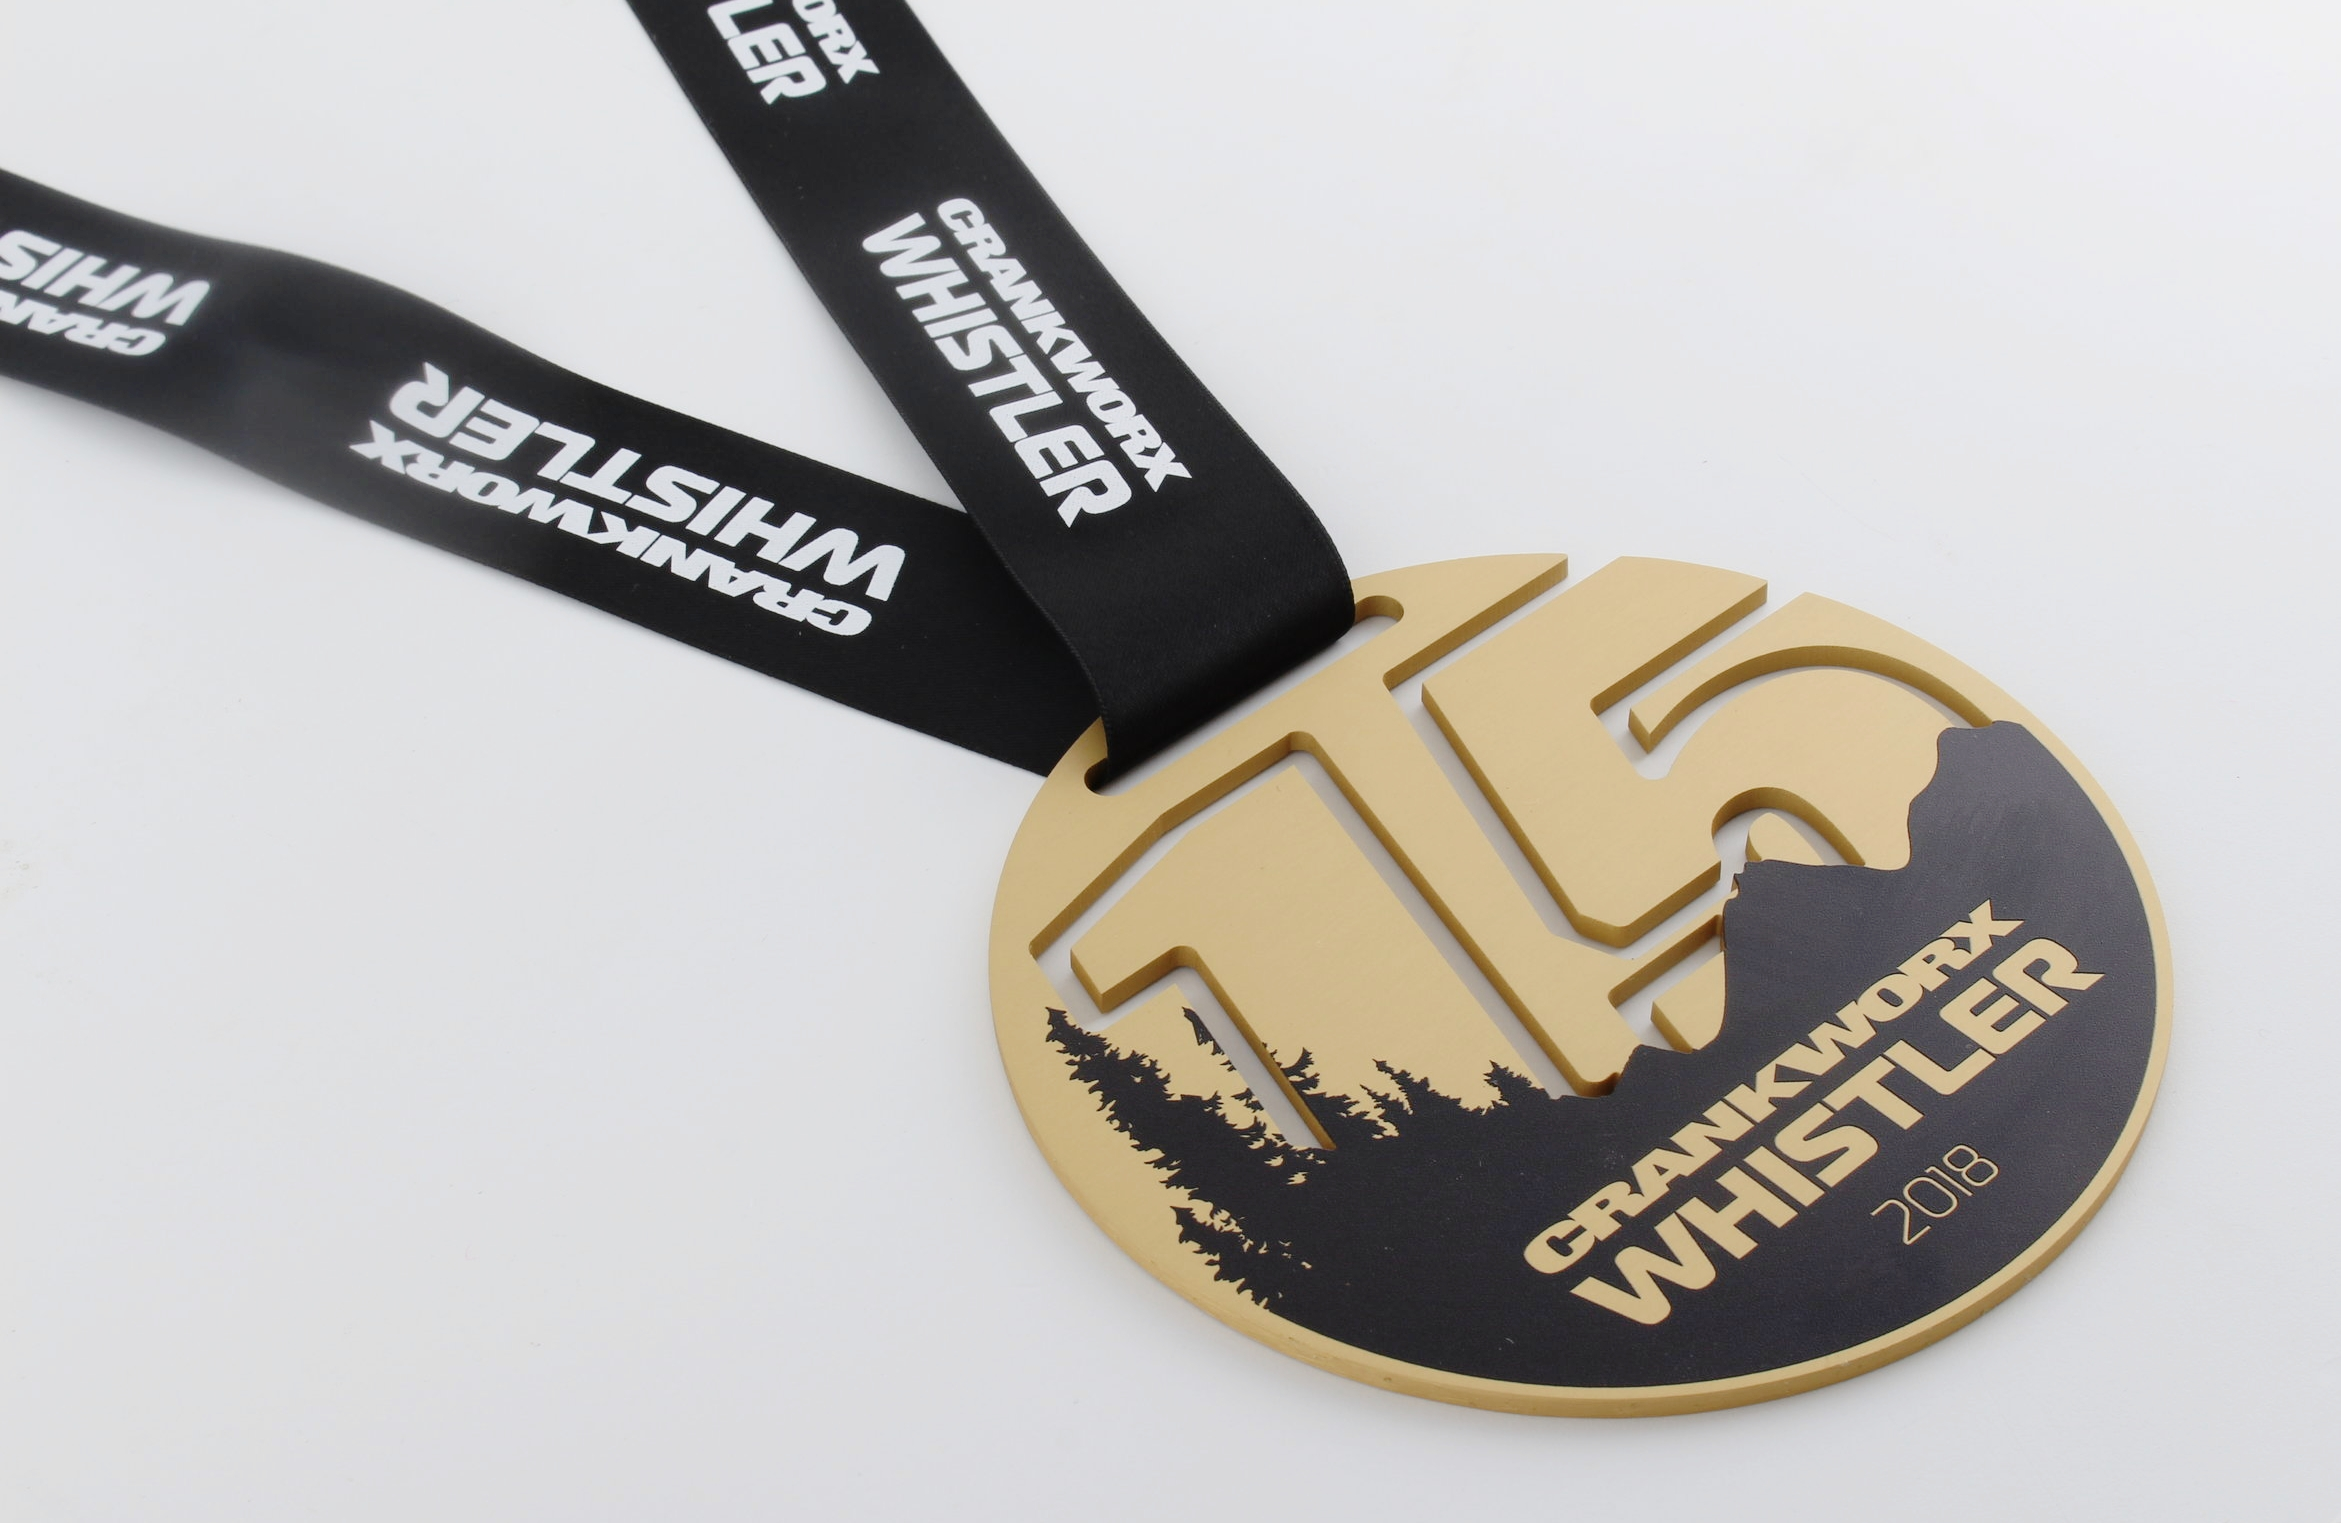 crankworx whistler 2018 medals